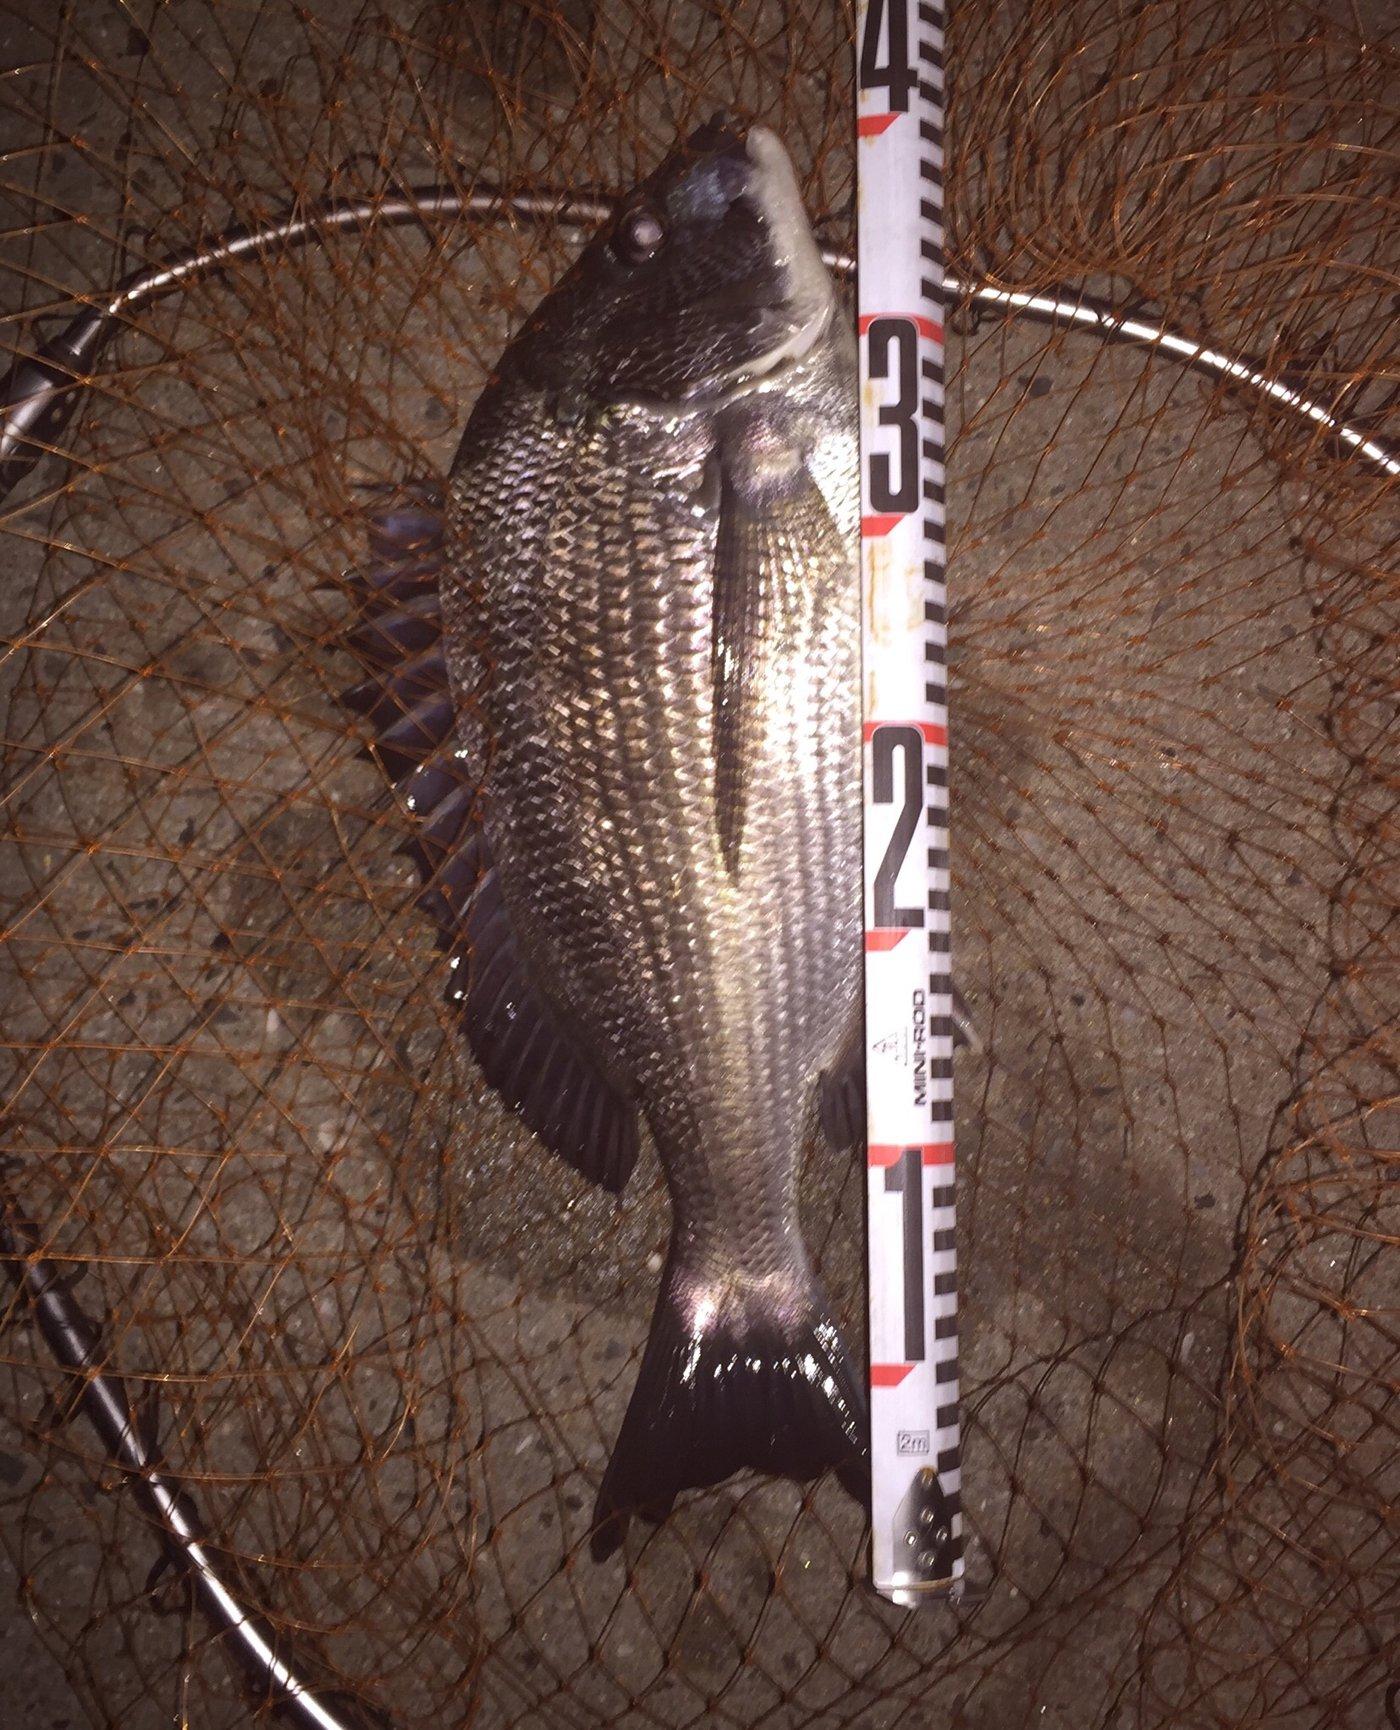 koarerさんの投稿画像,写っている魚はクロダイ,